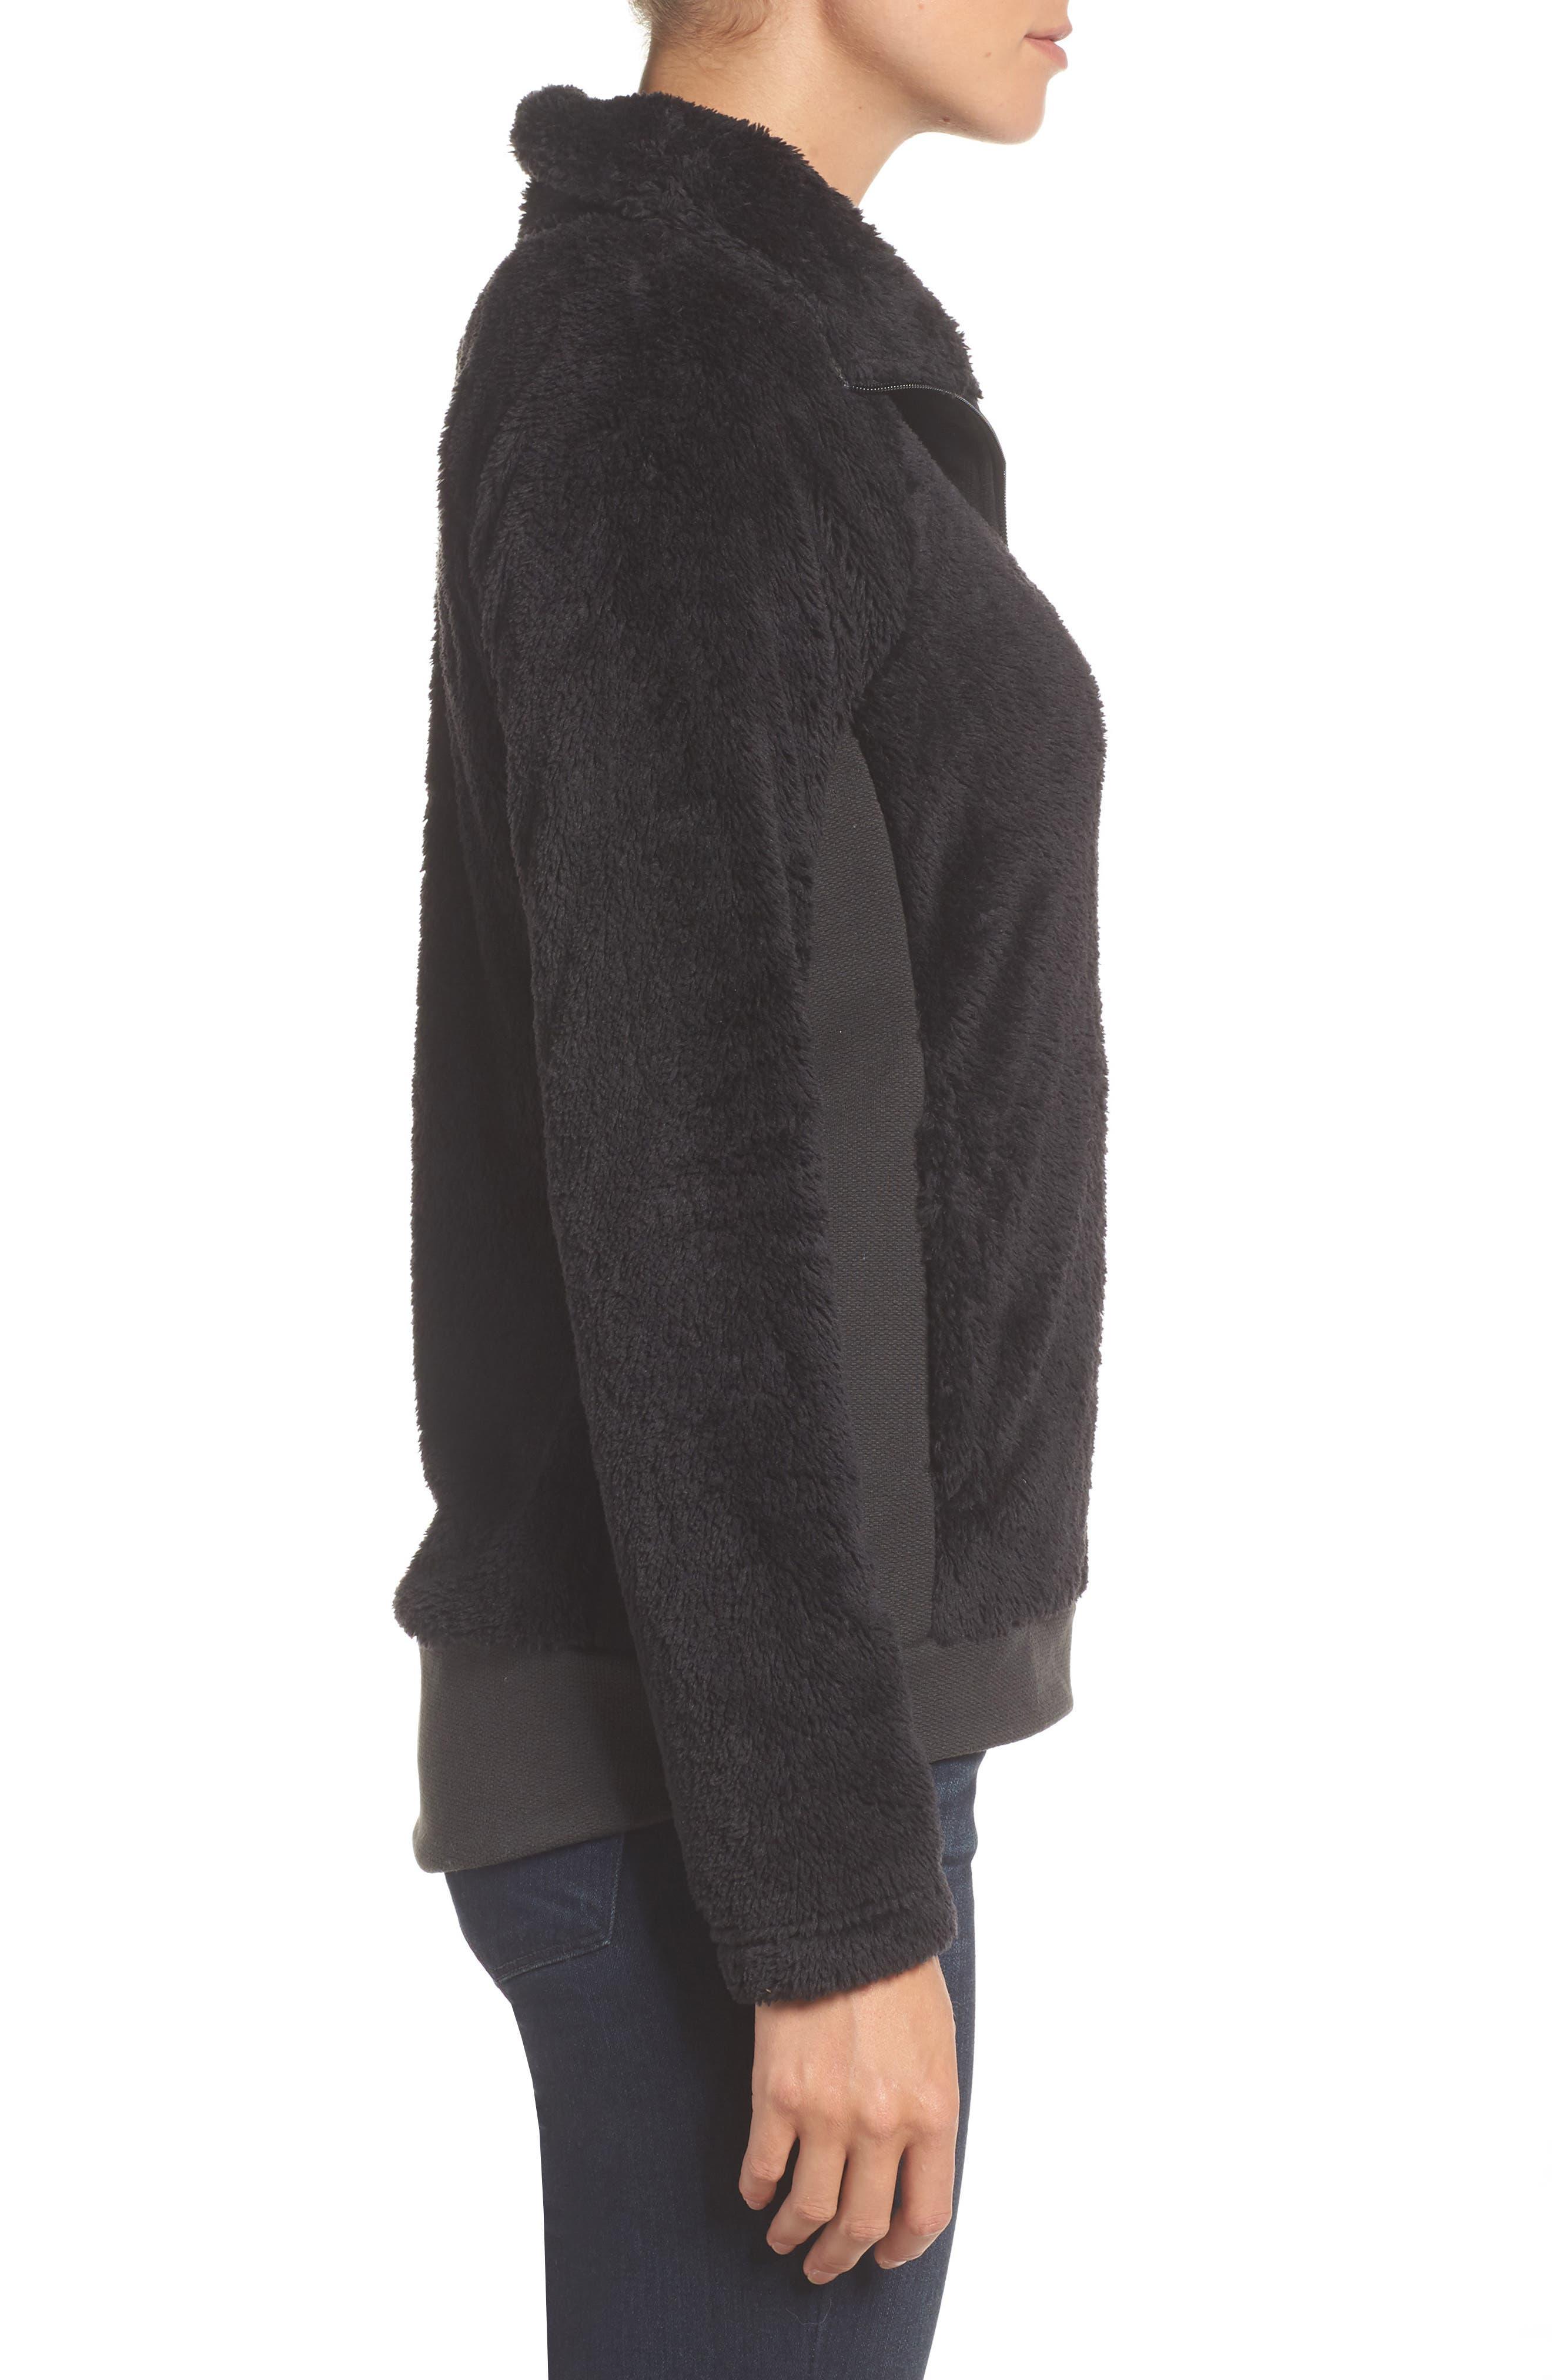 THE NORTH FACE, Furry Fleece Jacket, Alternate thumbnail 4, color, TNF BLACK